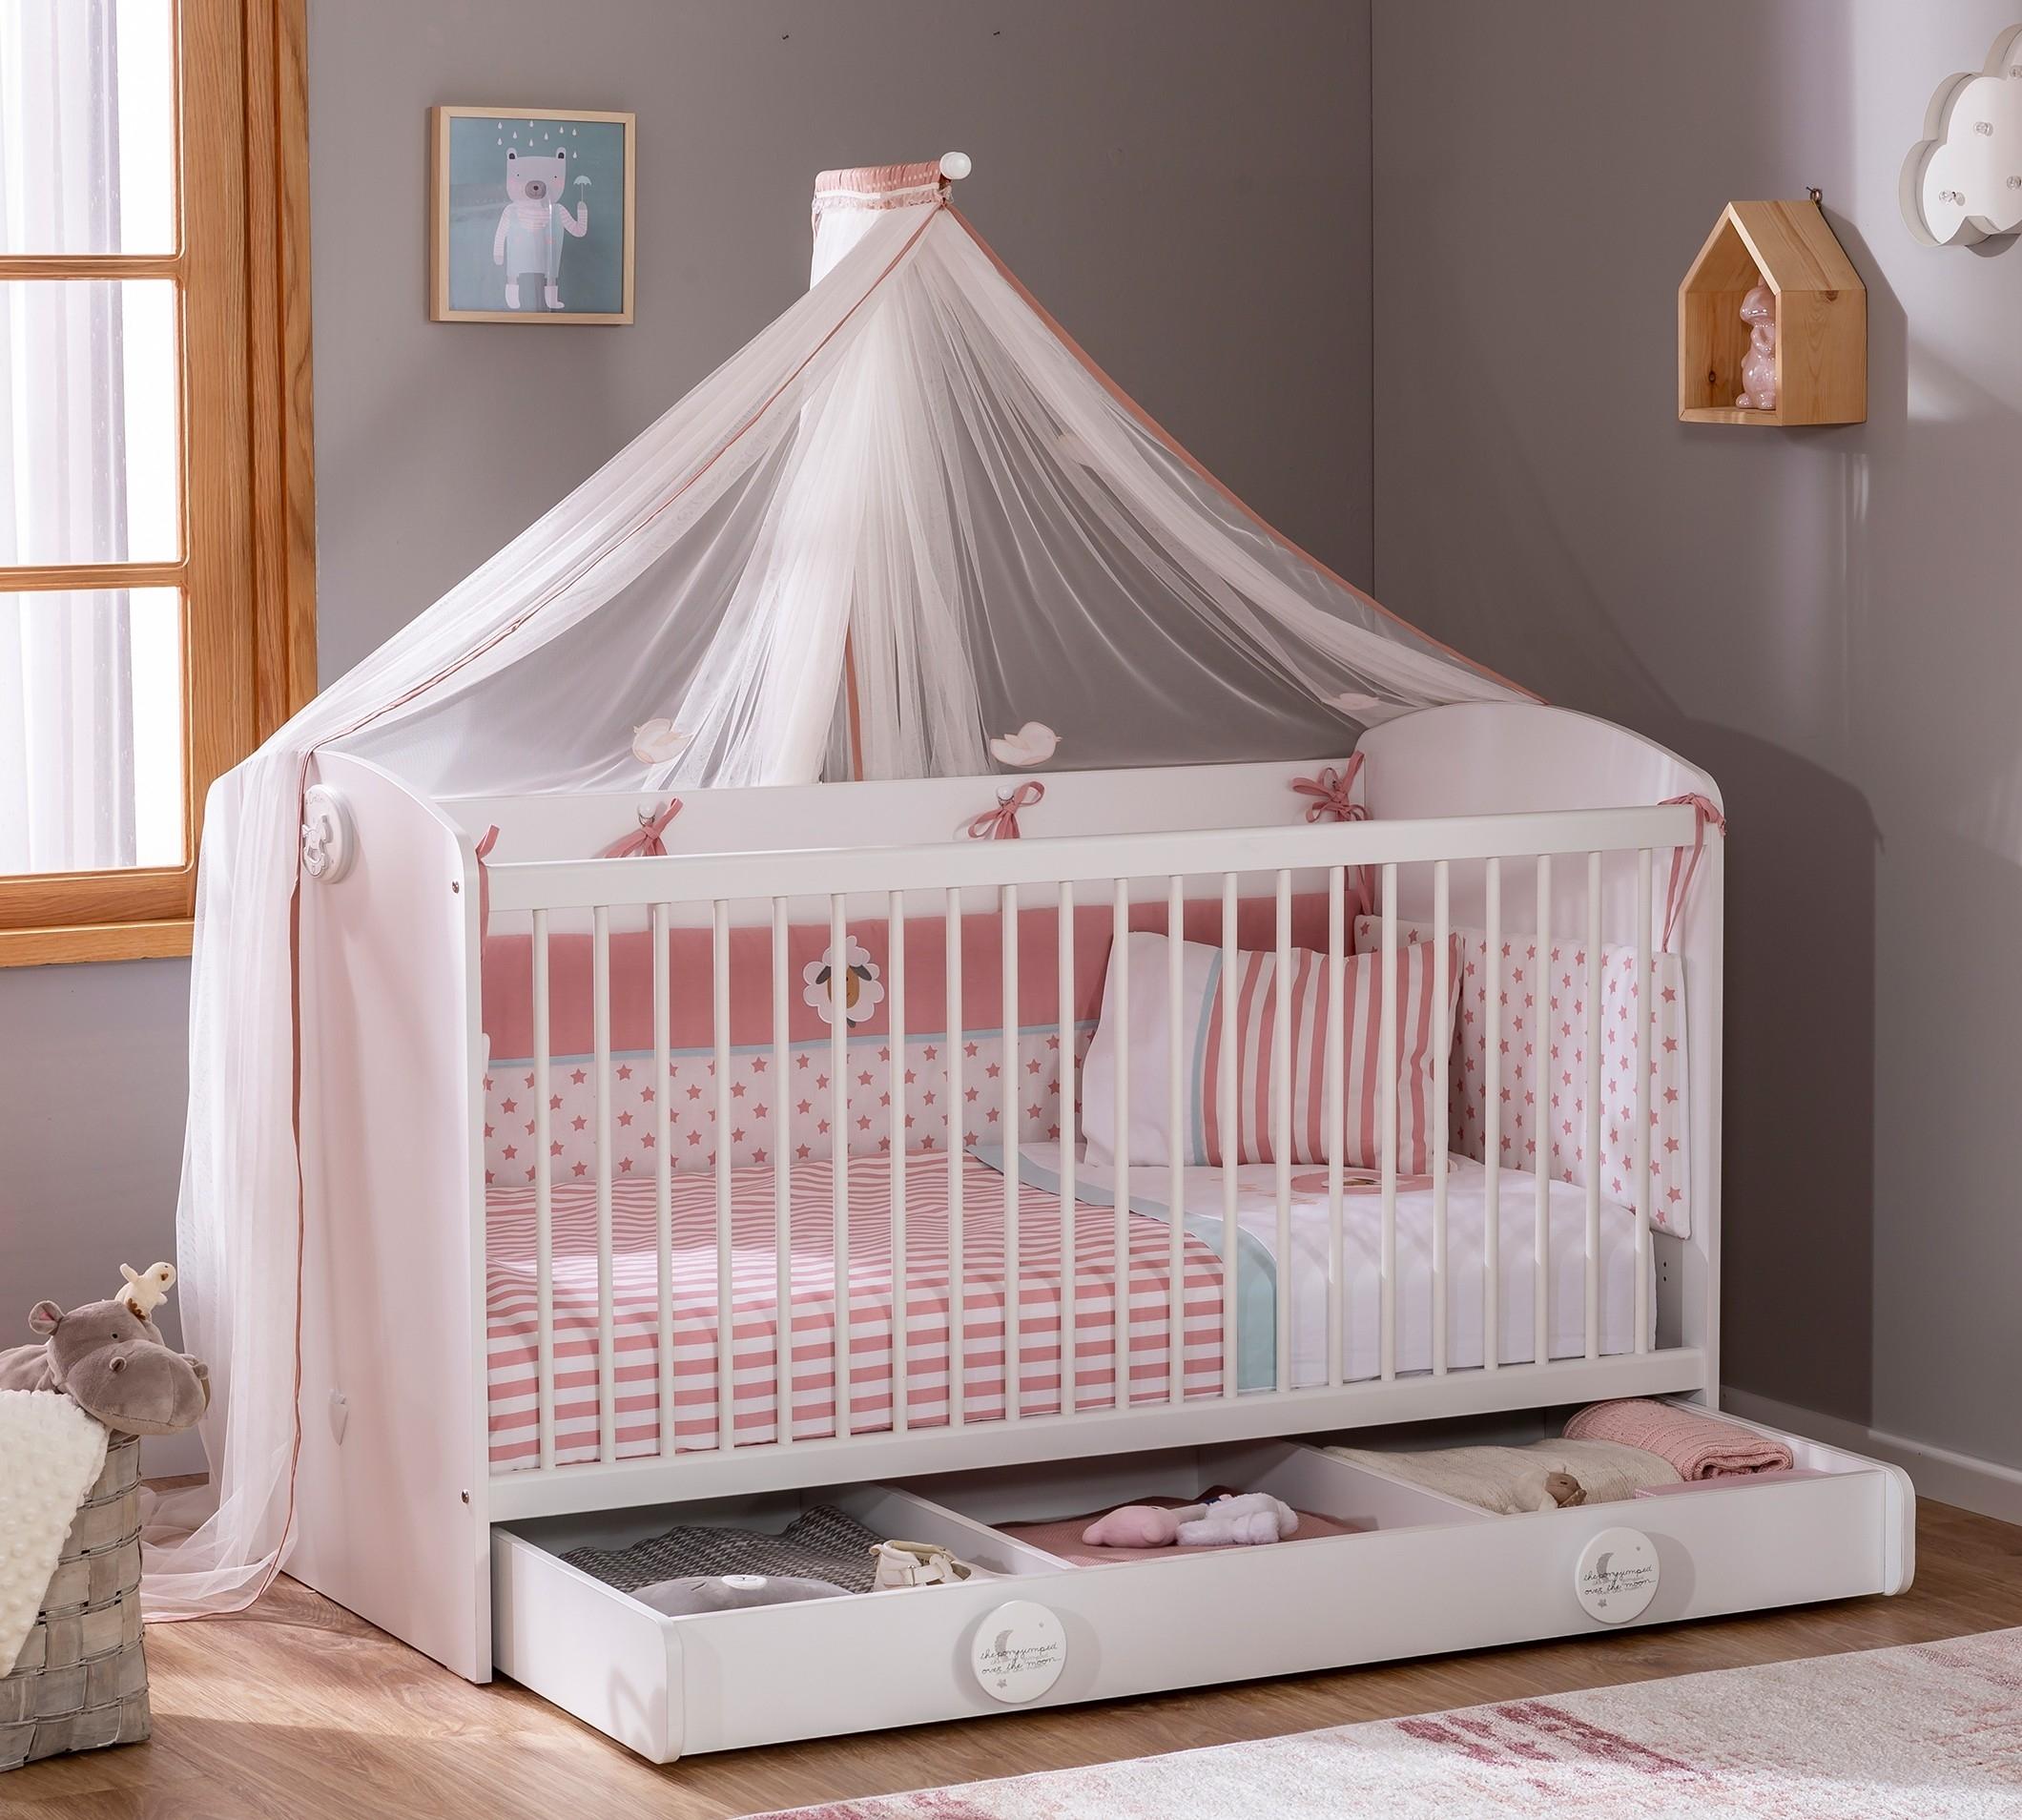 Patut din pal cu sertar pentru bebe Baby Cotton White, 140 x 70 cm poza